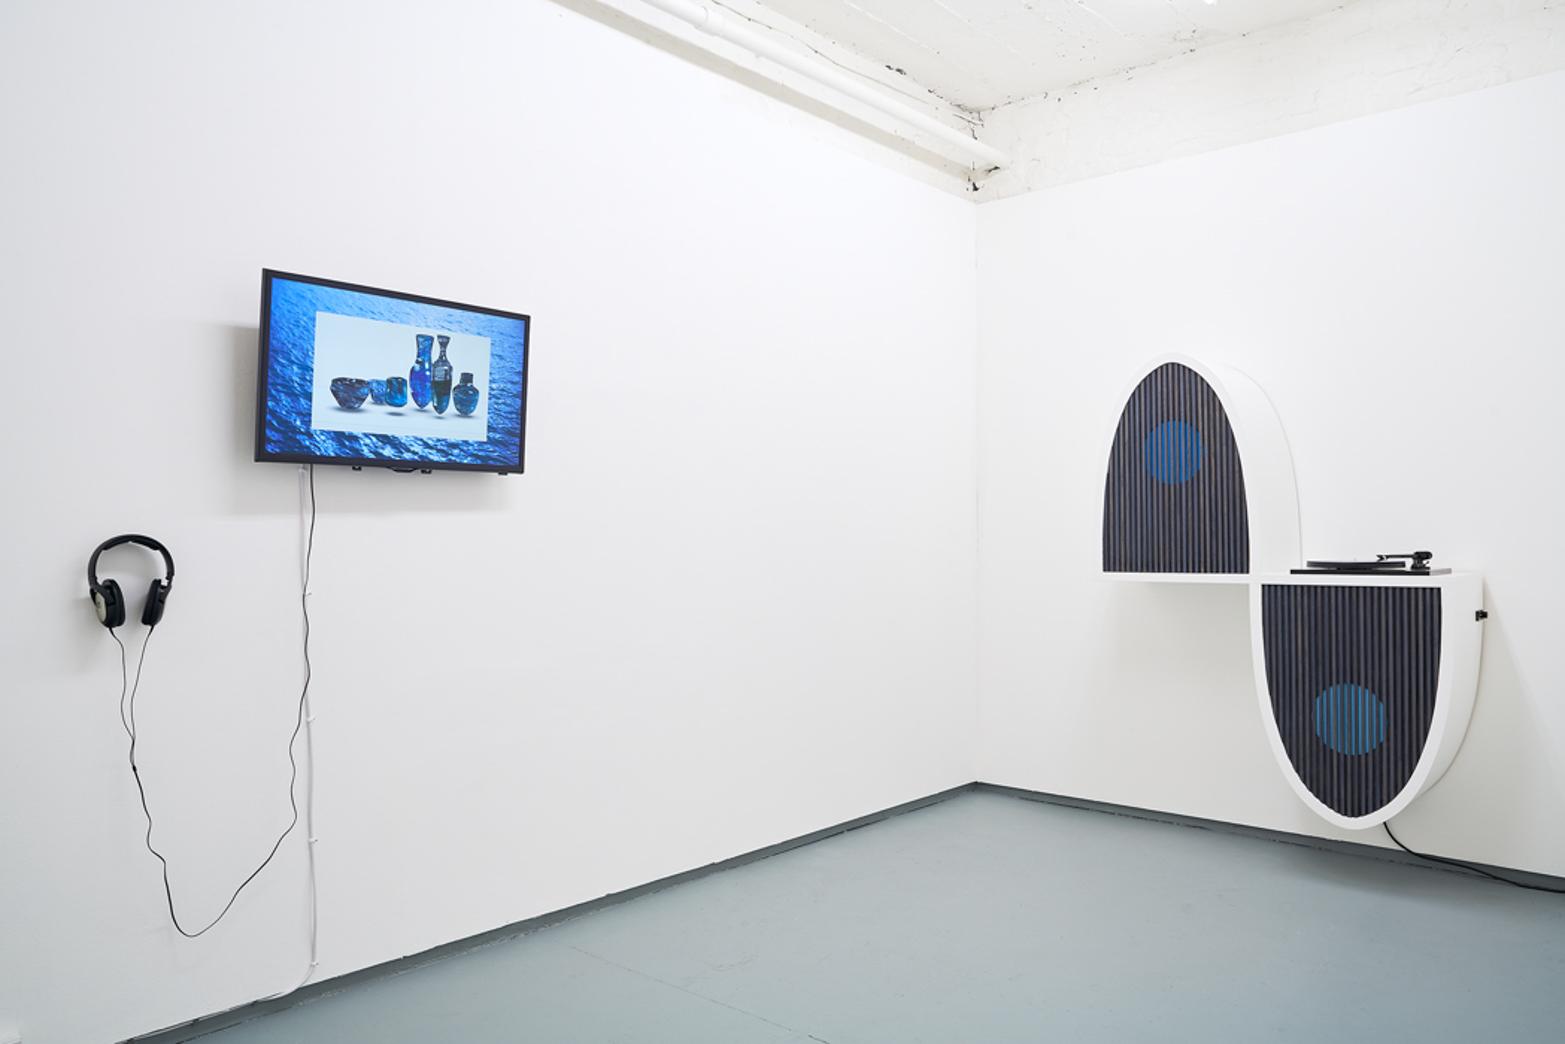 David Ferrando Giraut,Second Nature, The Sea and the Waves, 2014. Tenderpixel.